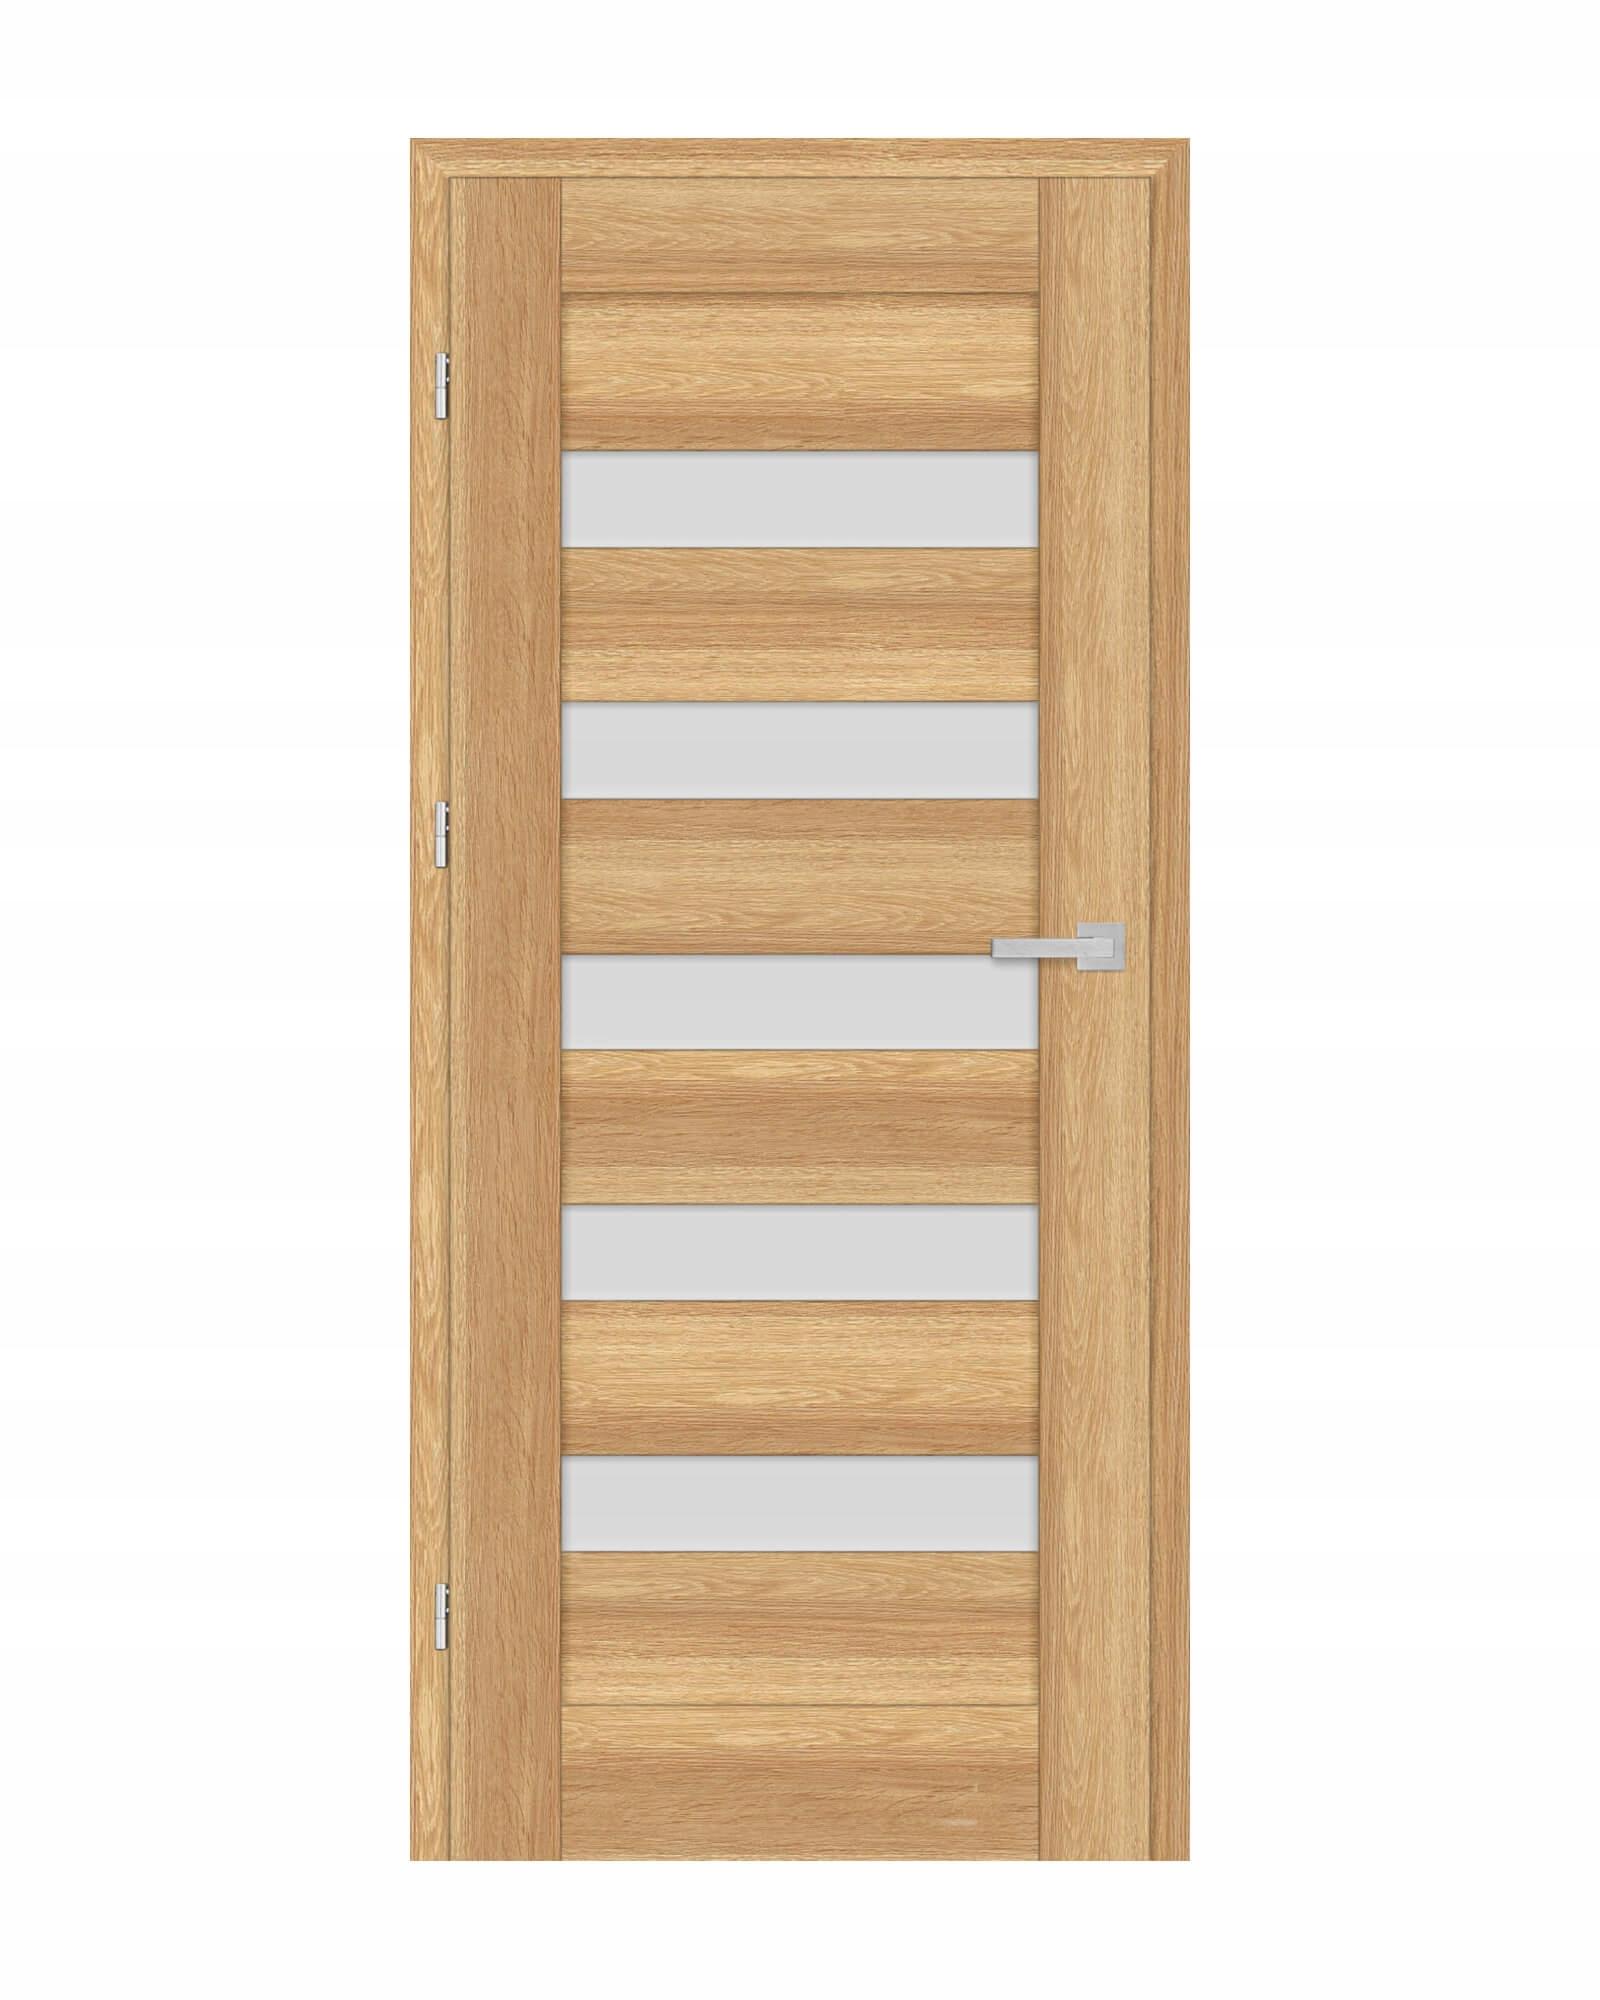 ERKADO drzwi wewnętrzne MAGNOLIA modele GREKO 8931571113 - Allegro.pl